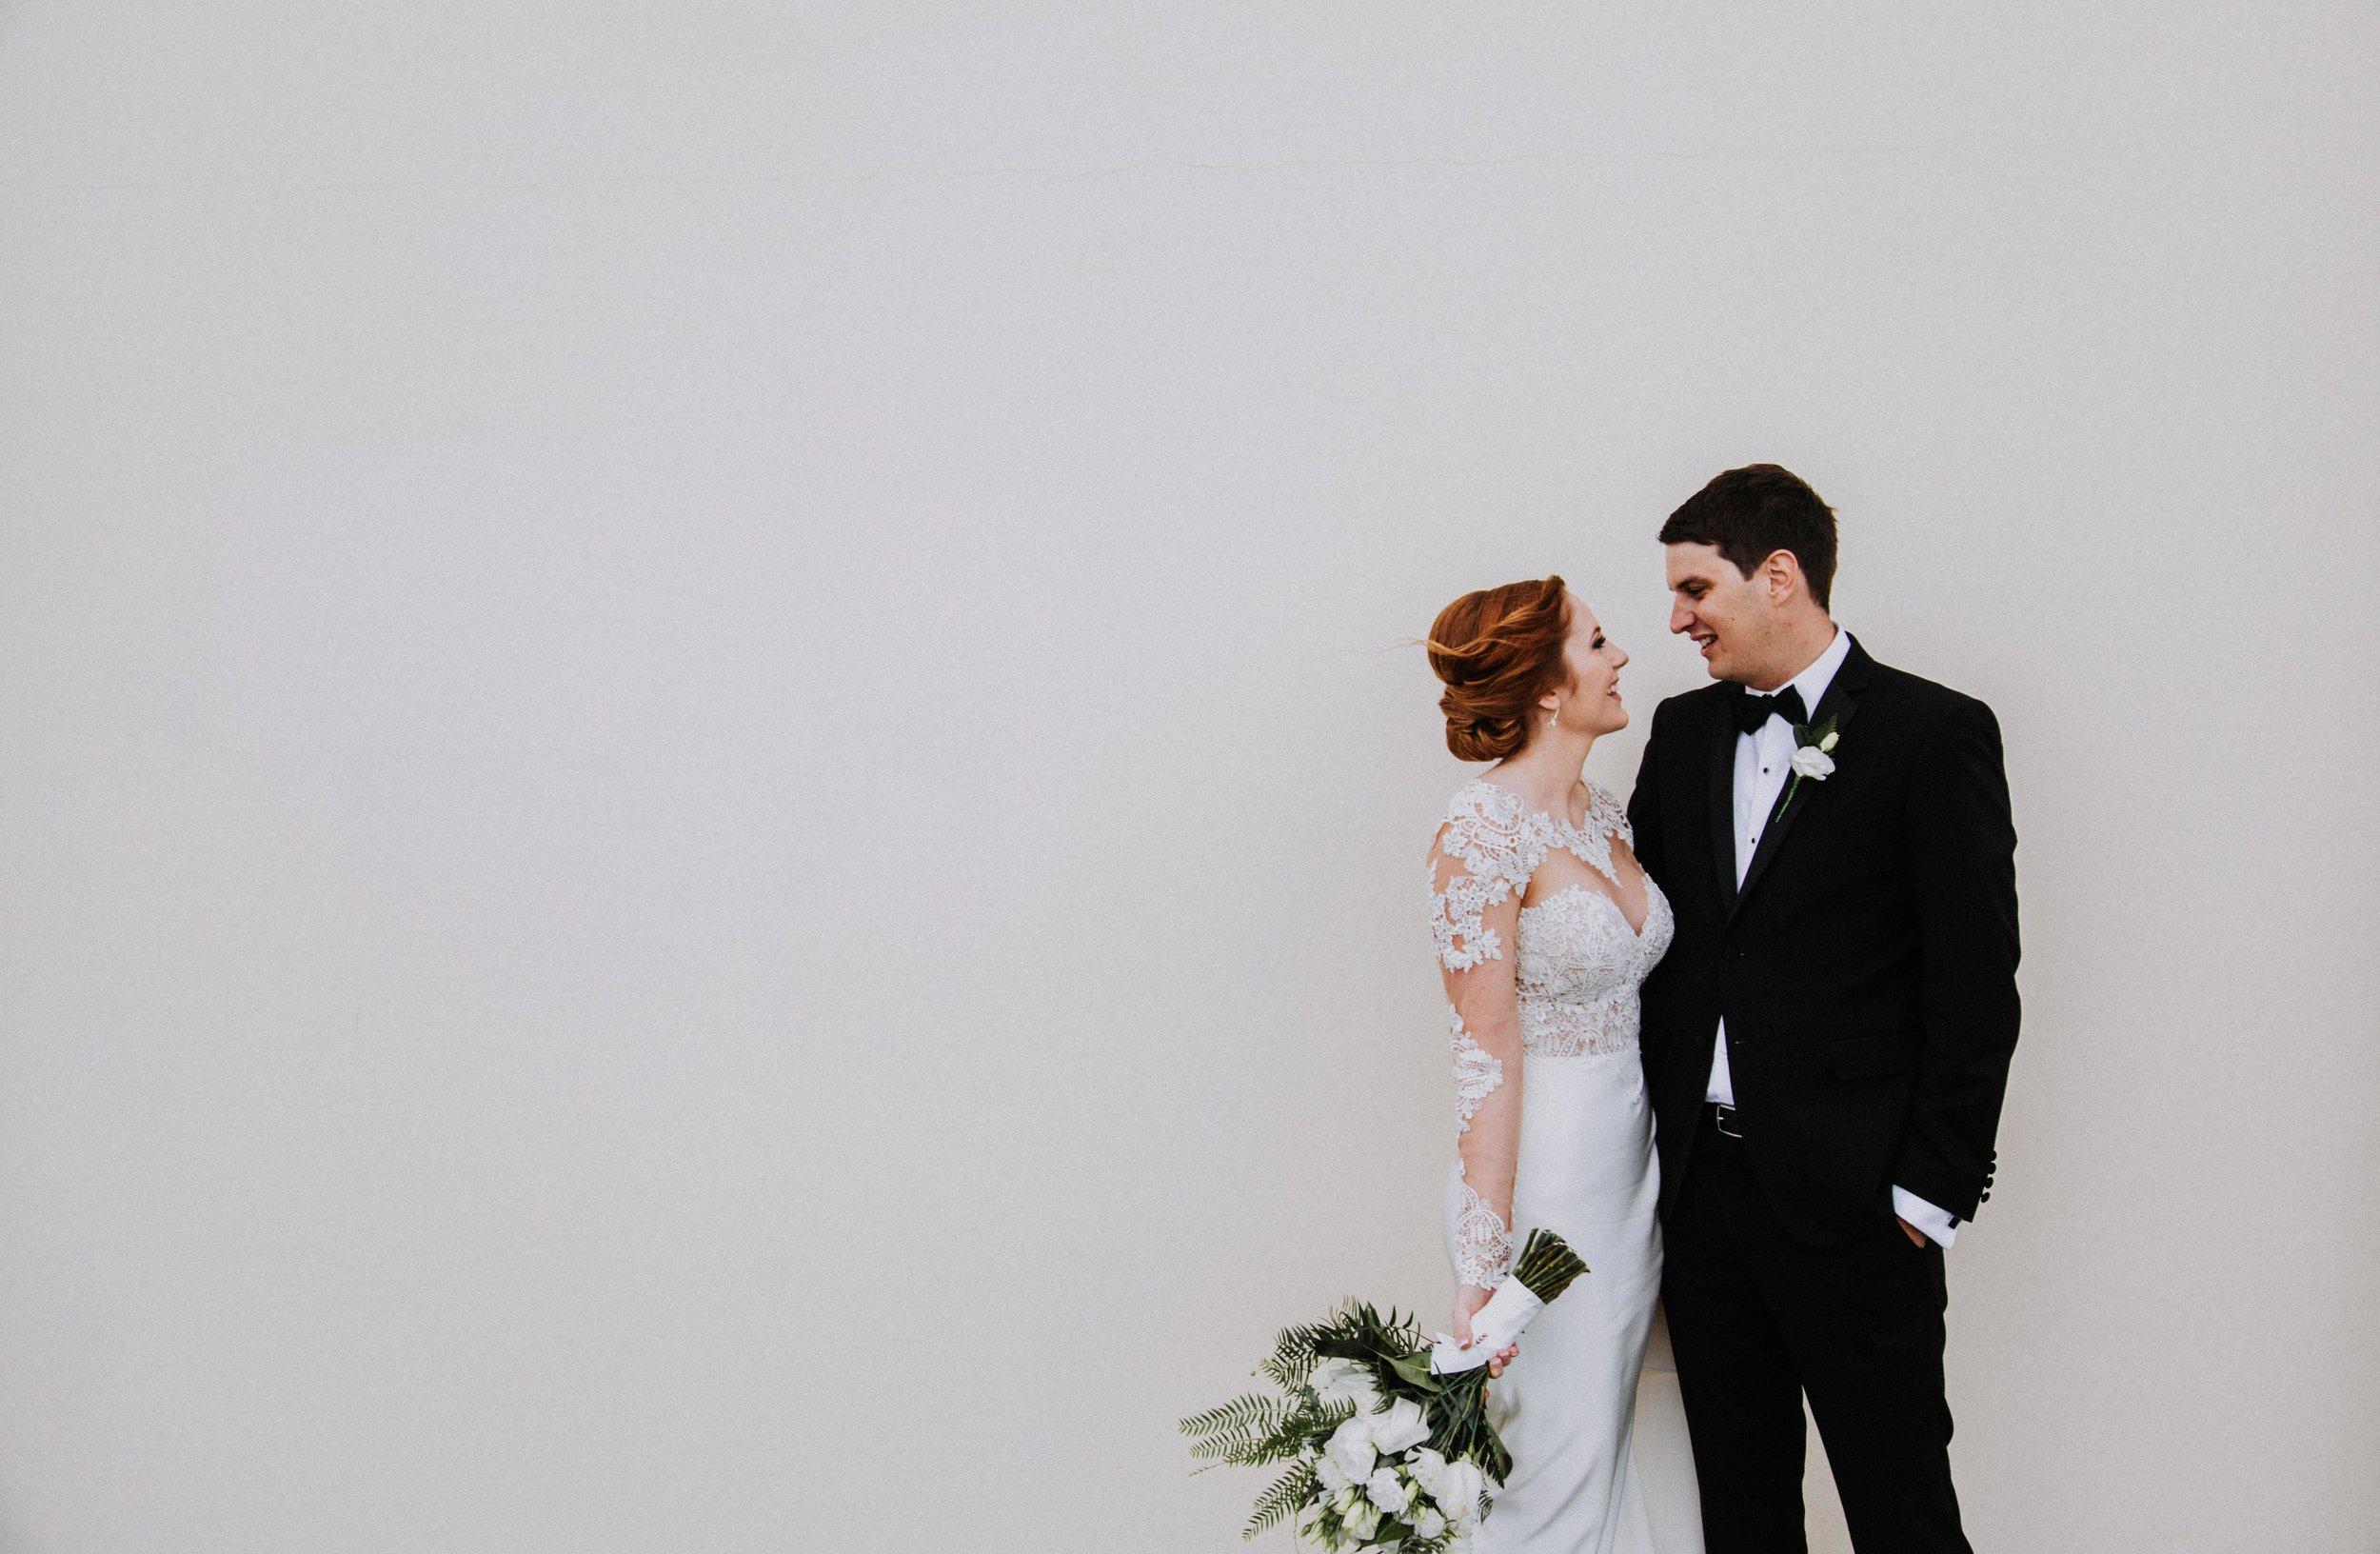 Monique + Nick Vincent - Wedding Photos FINALS-183.jpg